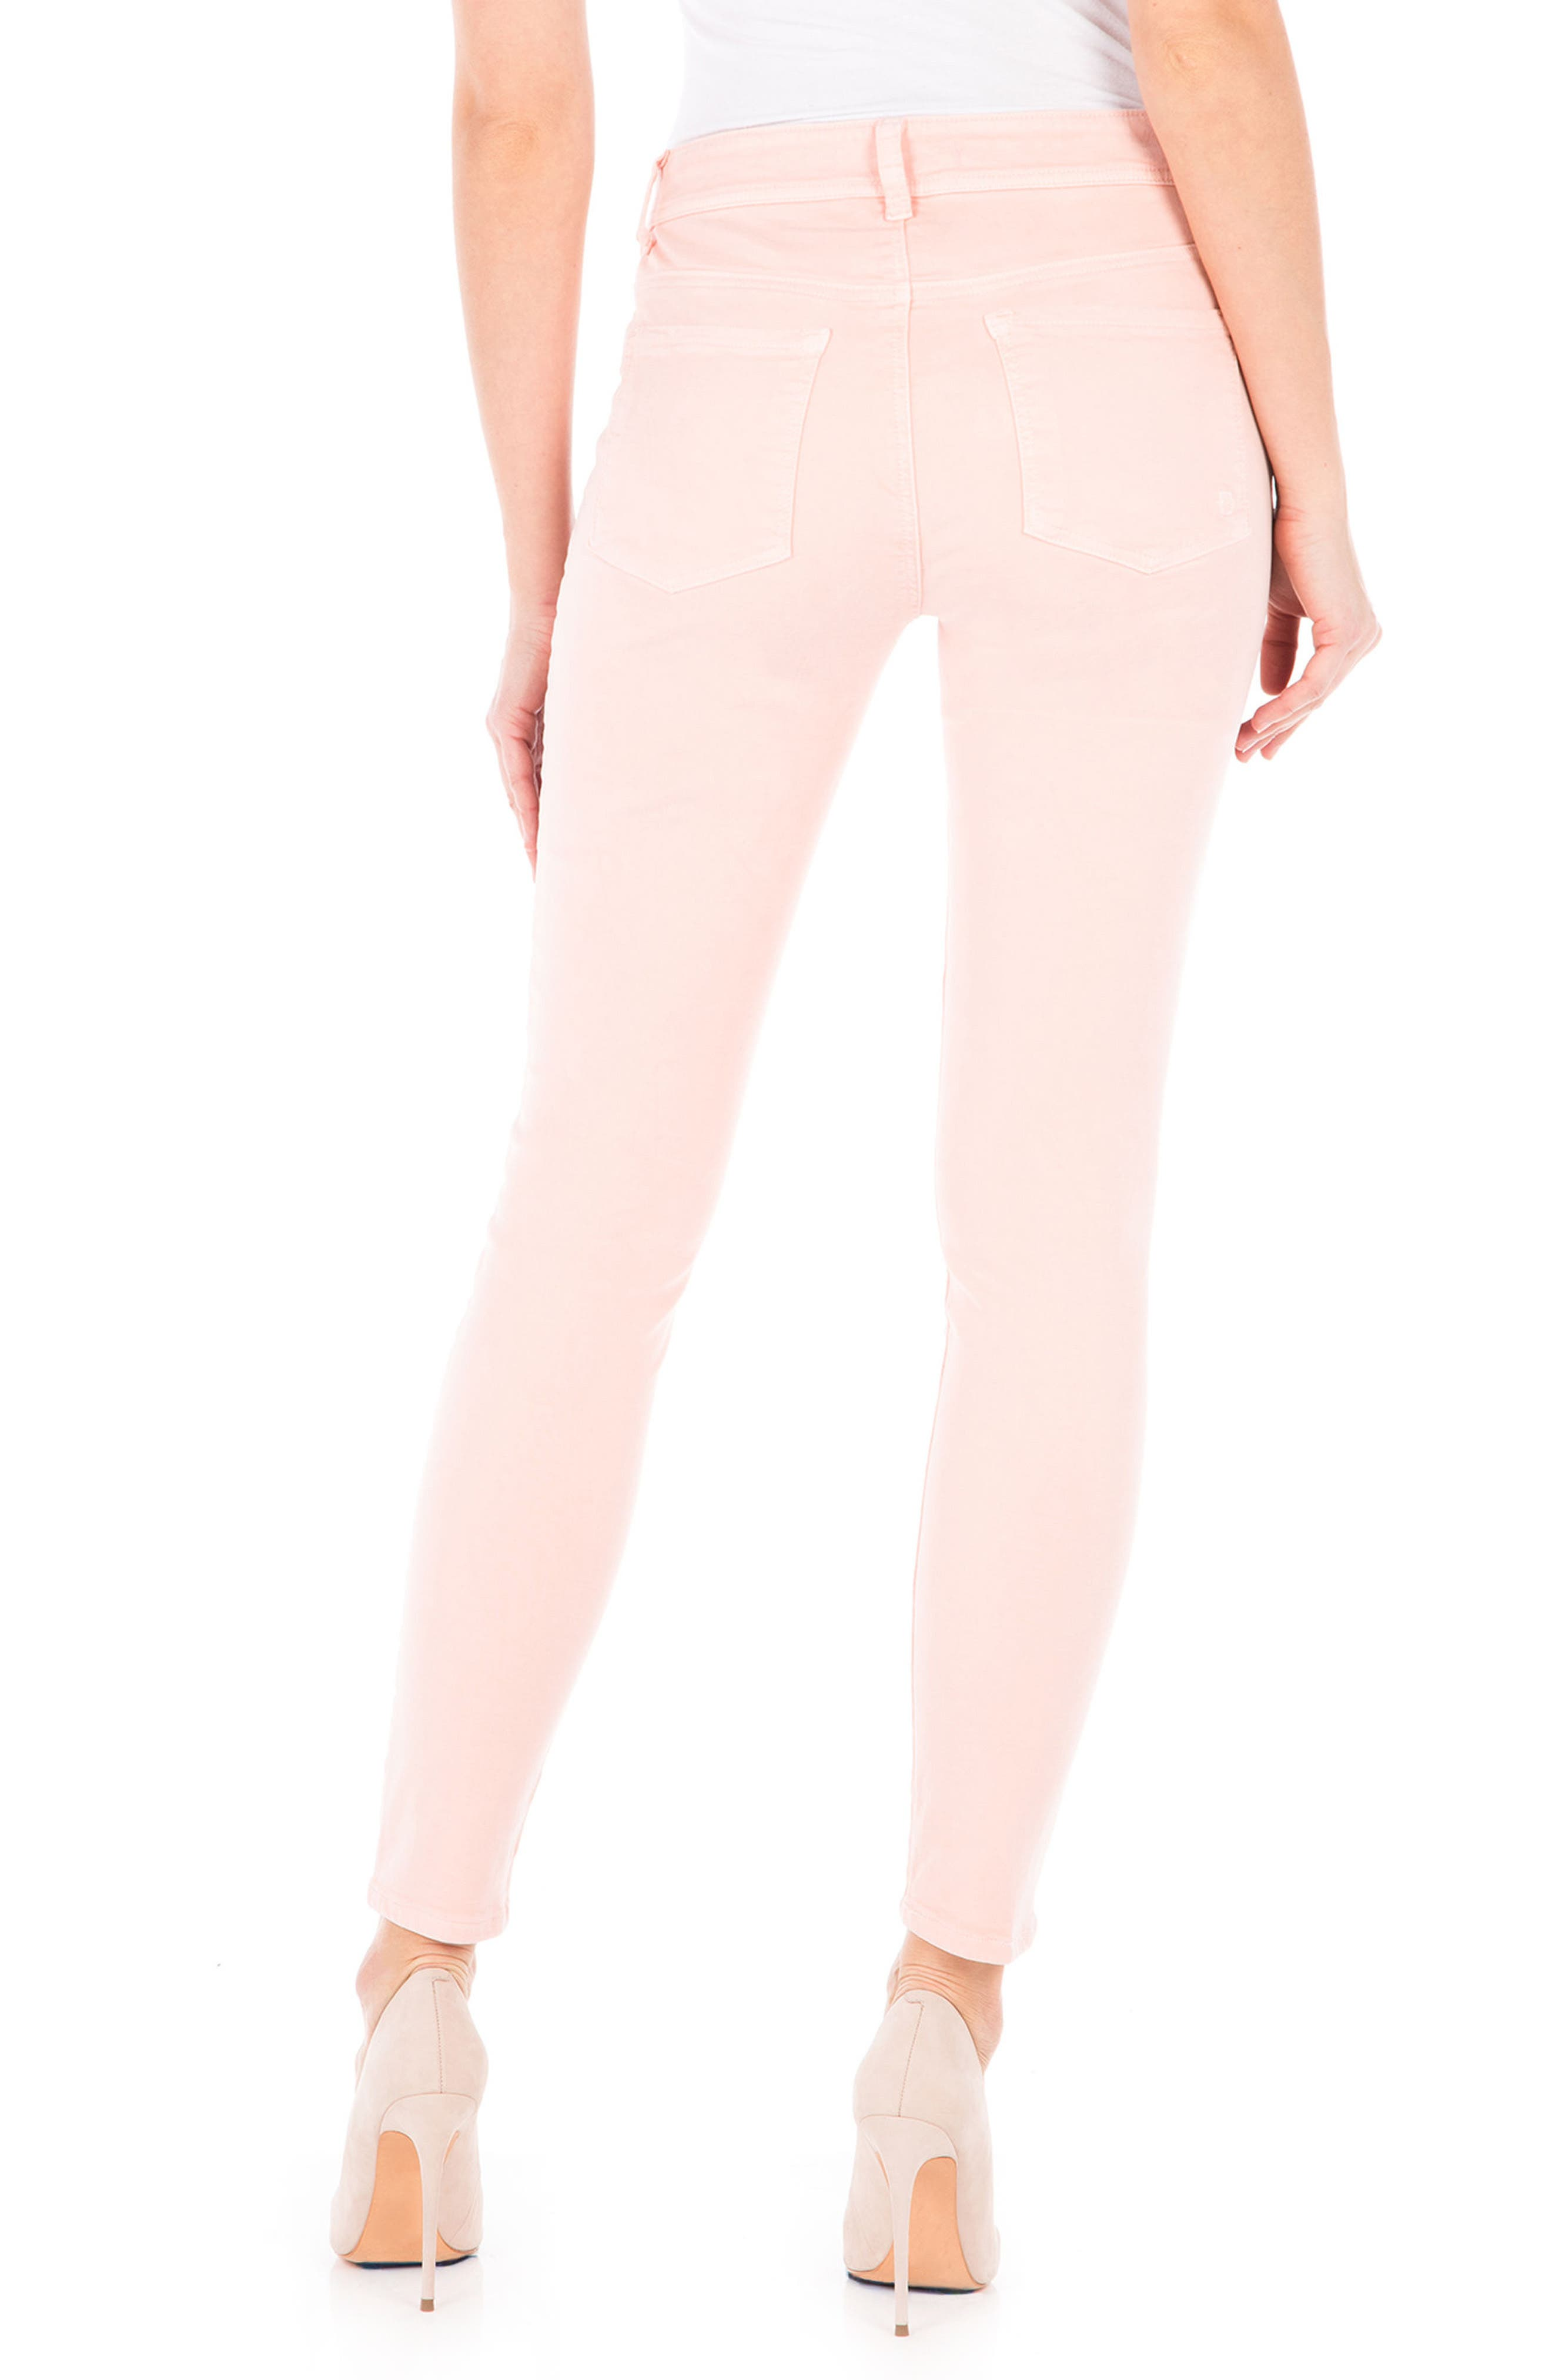 Sola Skinny Jeans,                             Alternate thumbnail 2, color,                             650